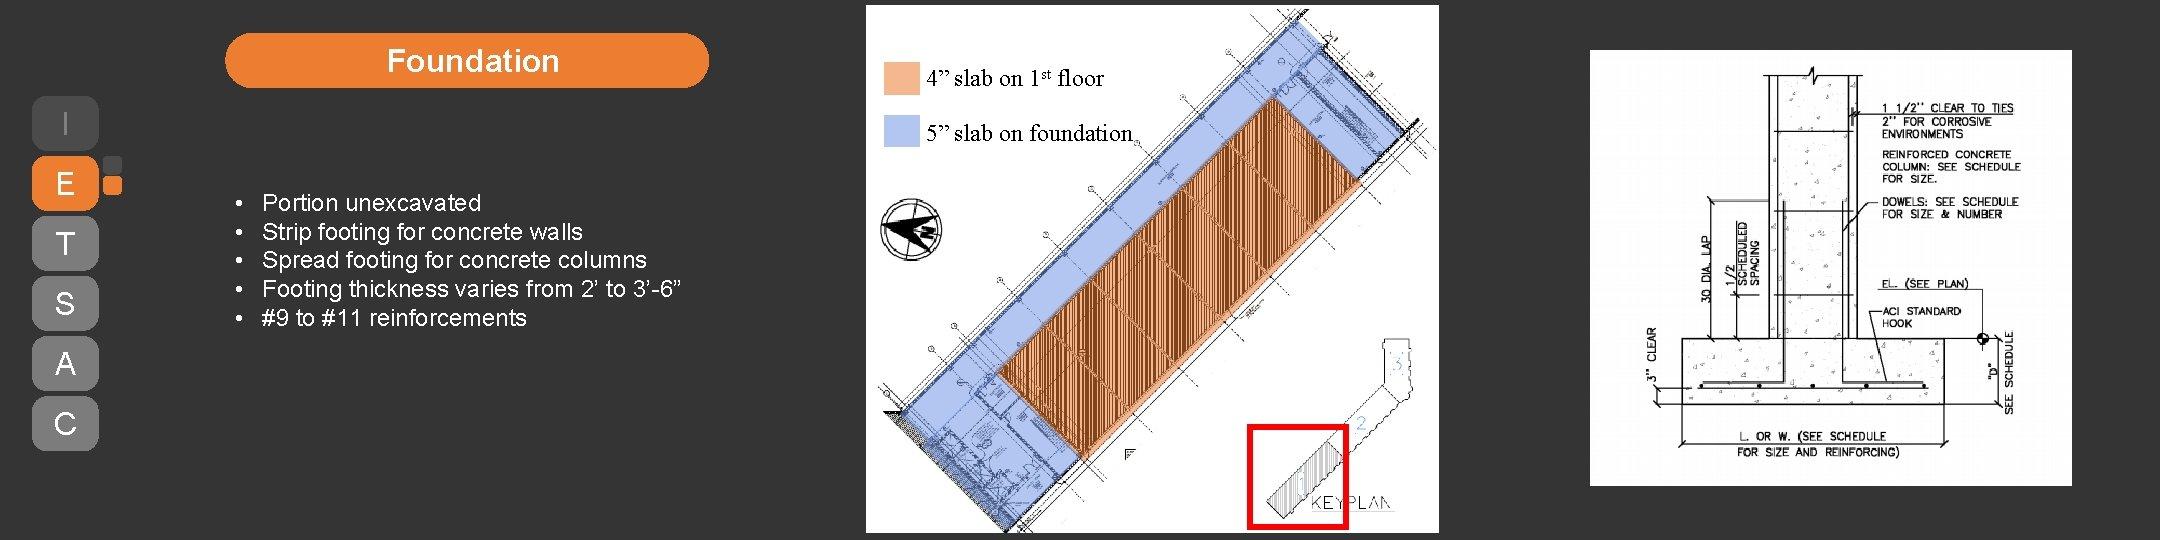 "Foundation I E T S A C 4"" slab on 1 st floor 5"""